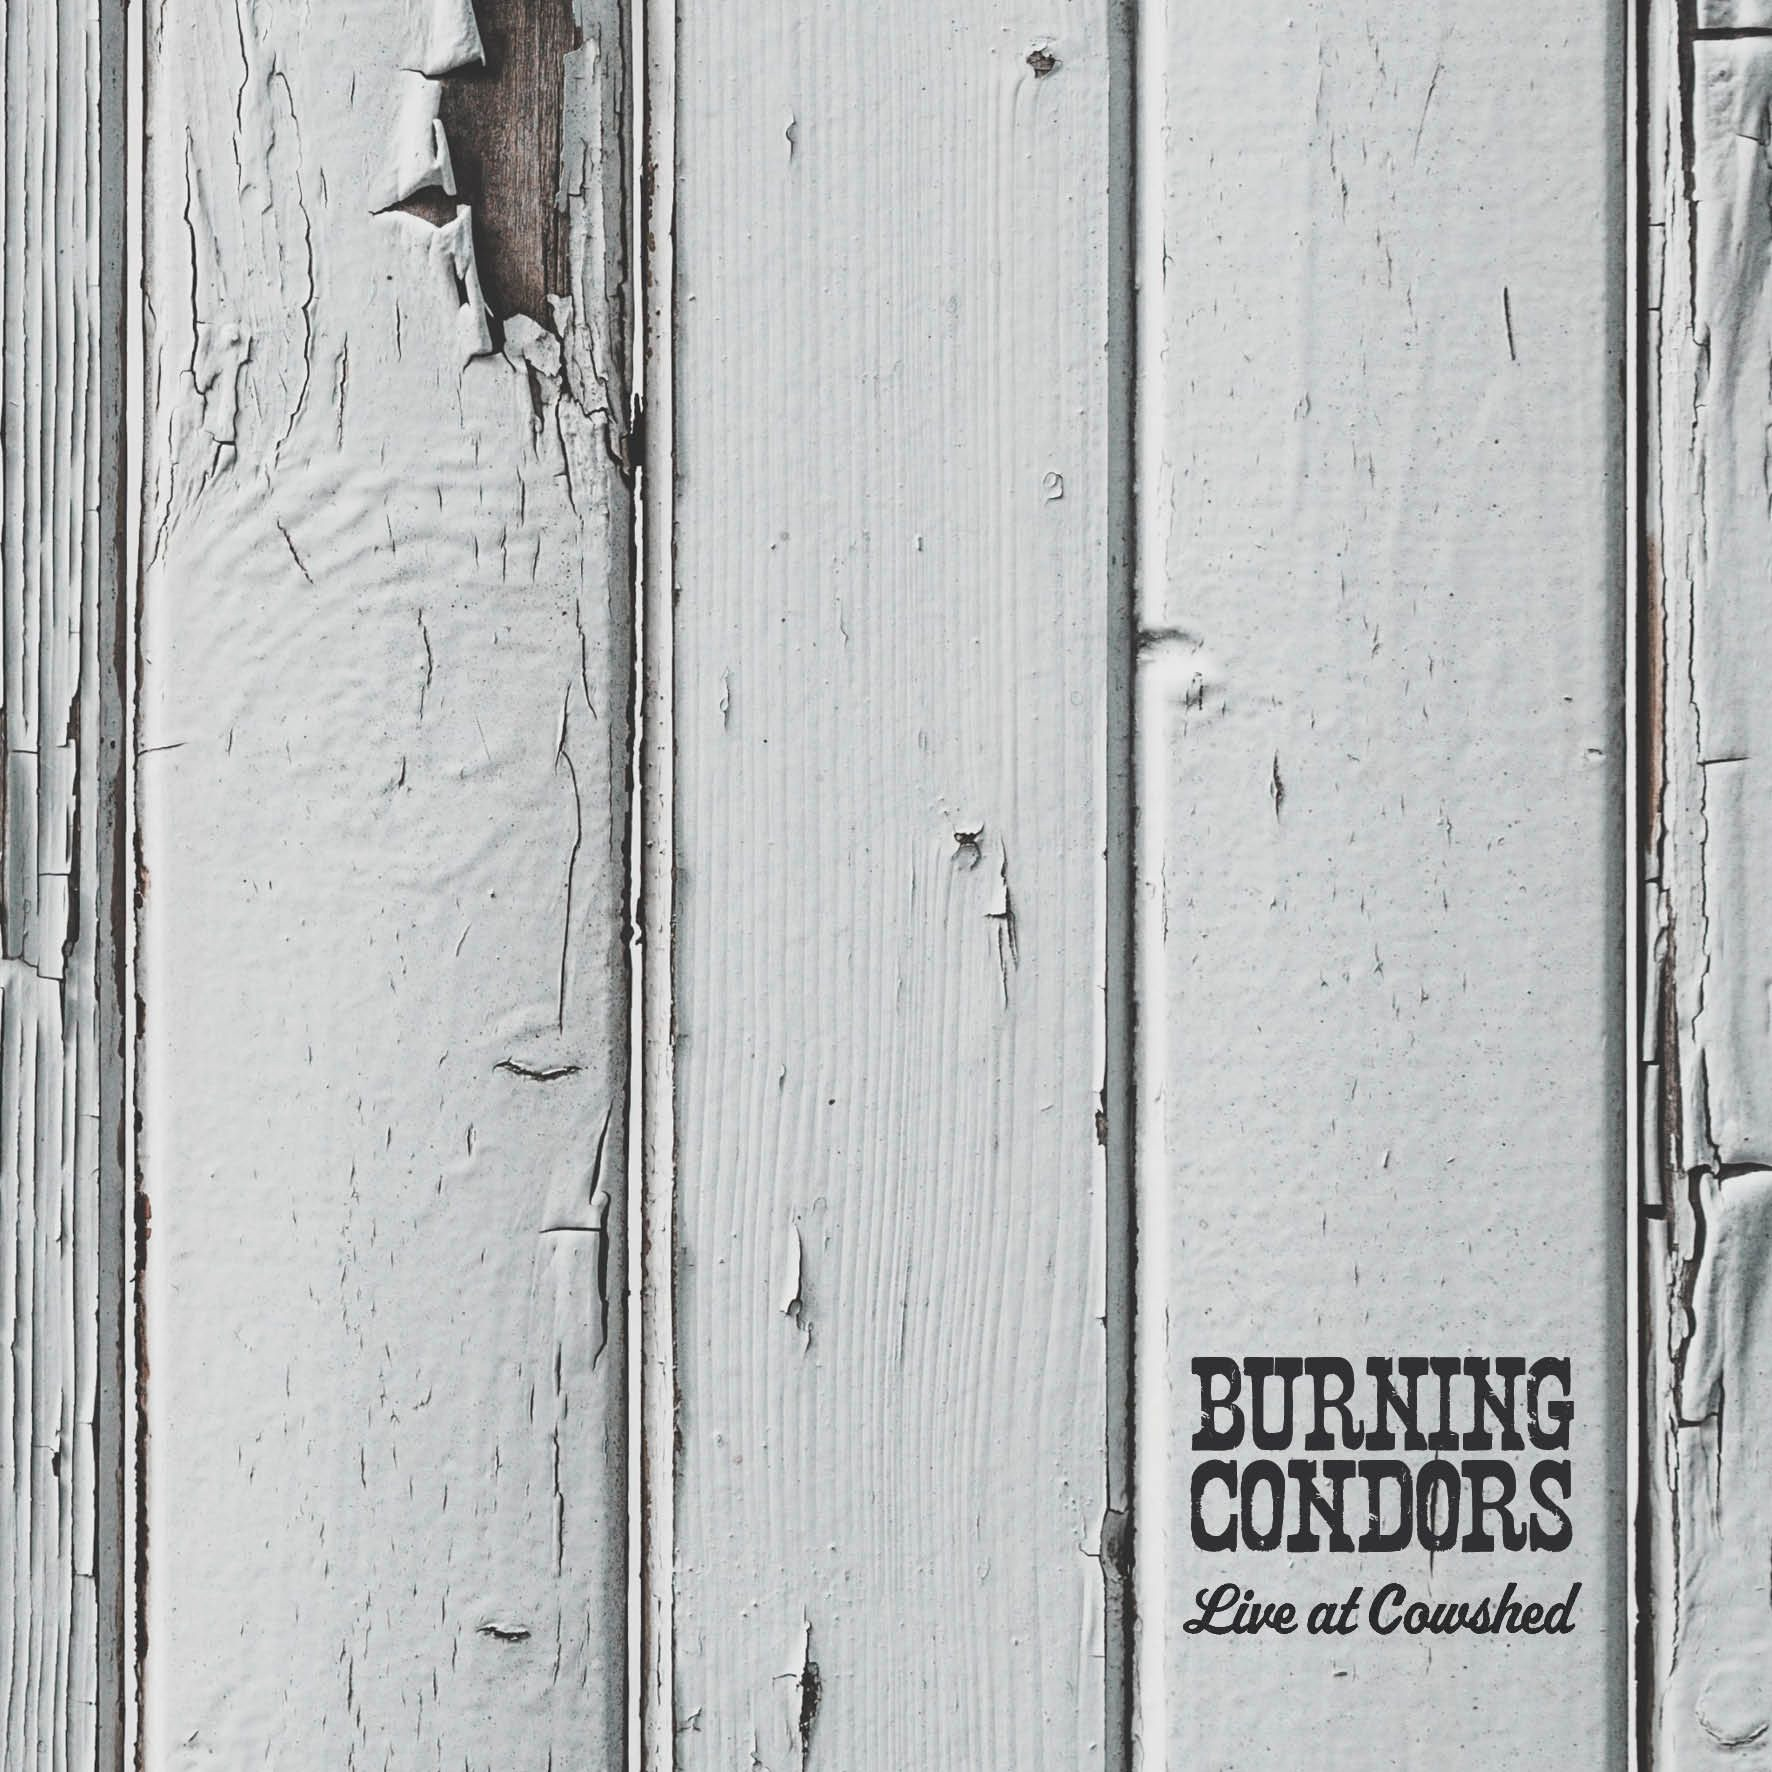 Burning Condors - Live at Cowshed